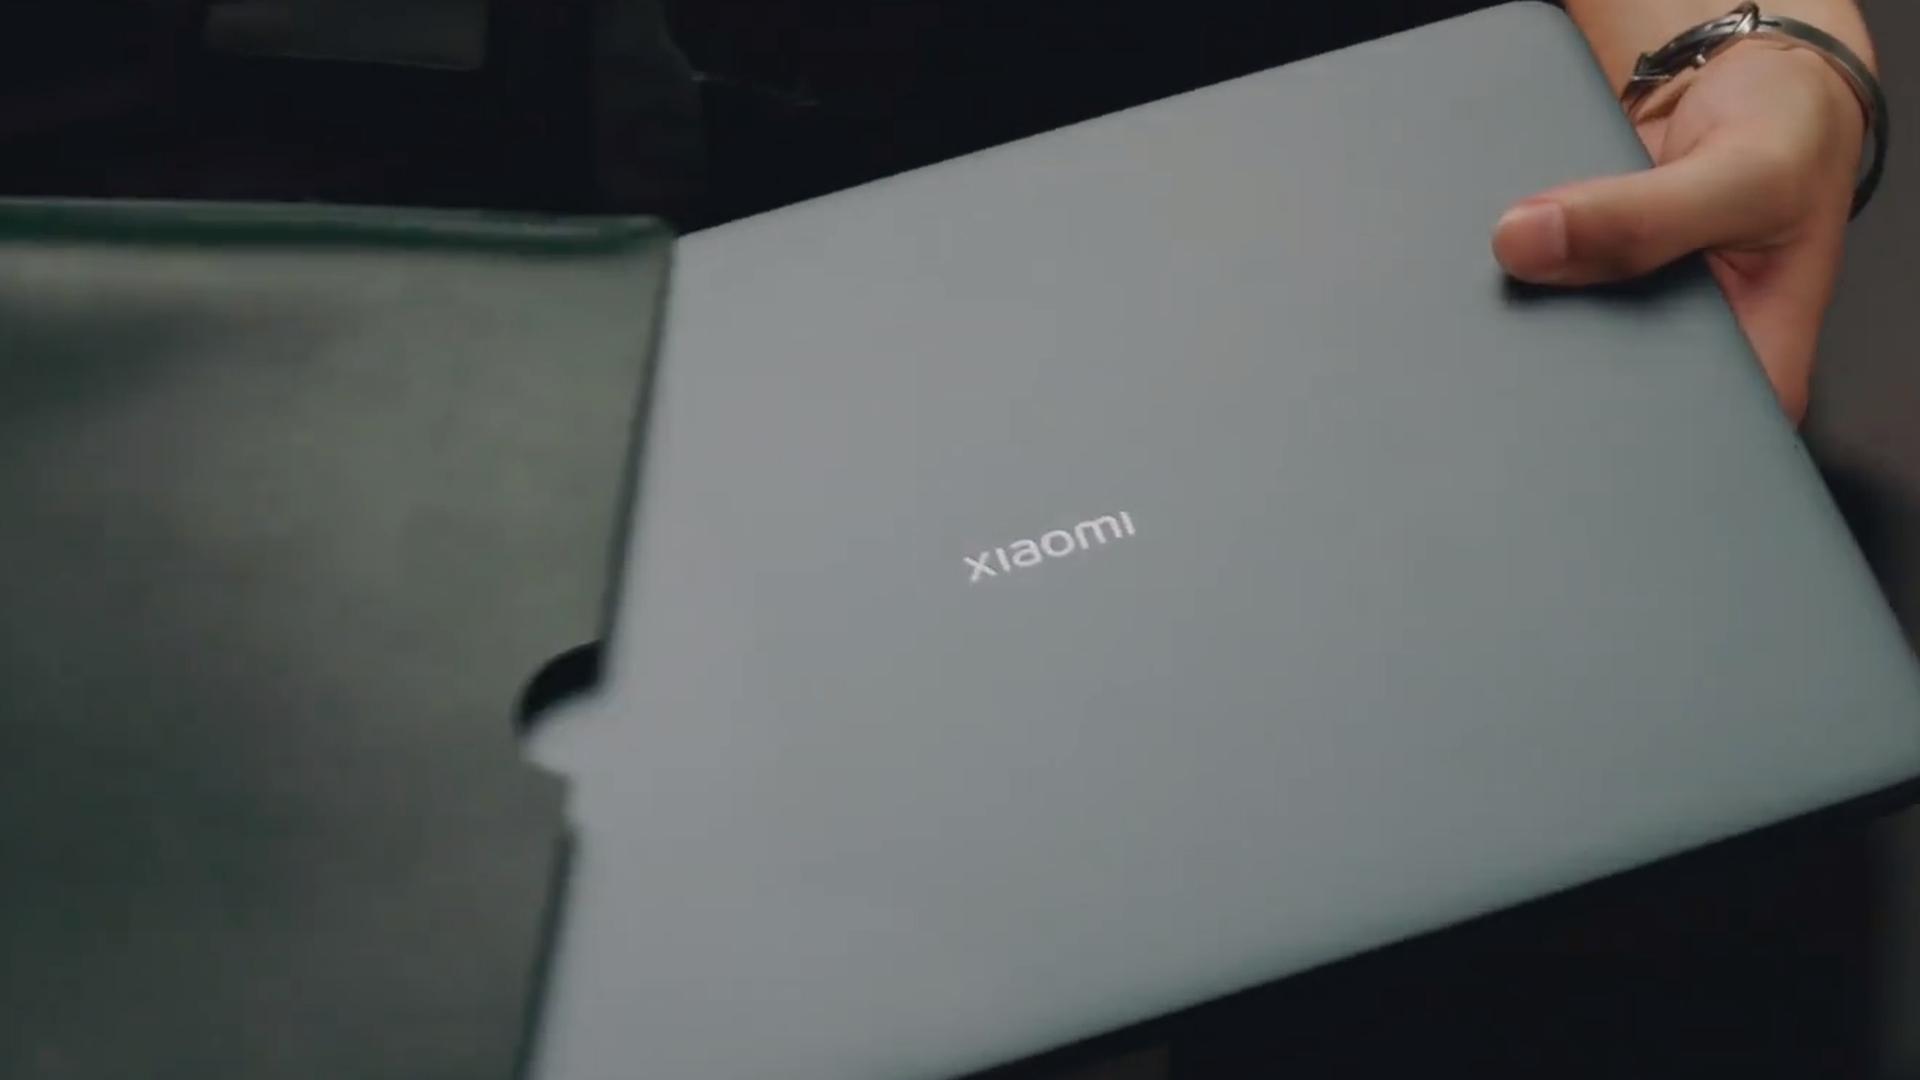 xiaomi mi notebook x pro 15 2